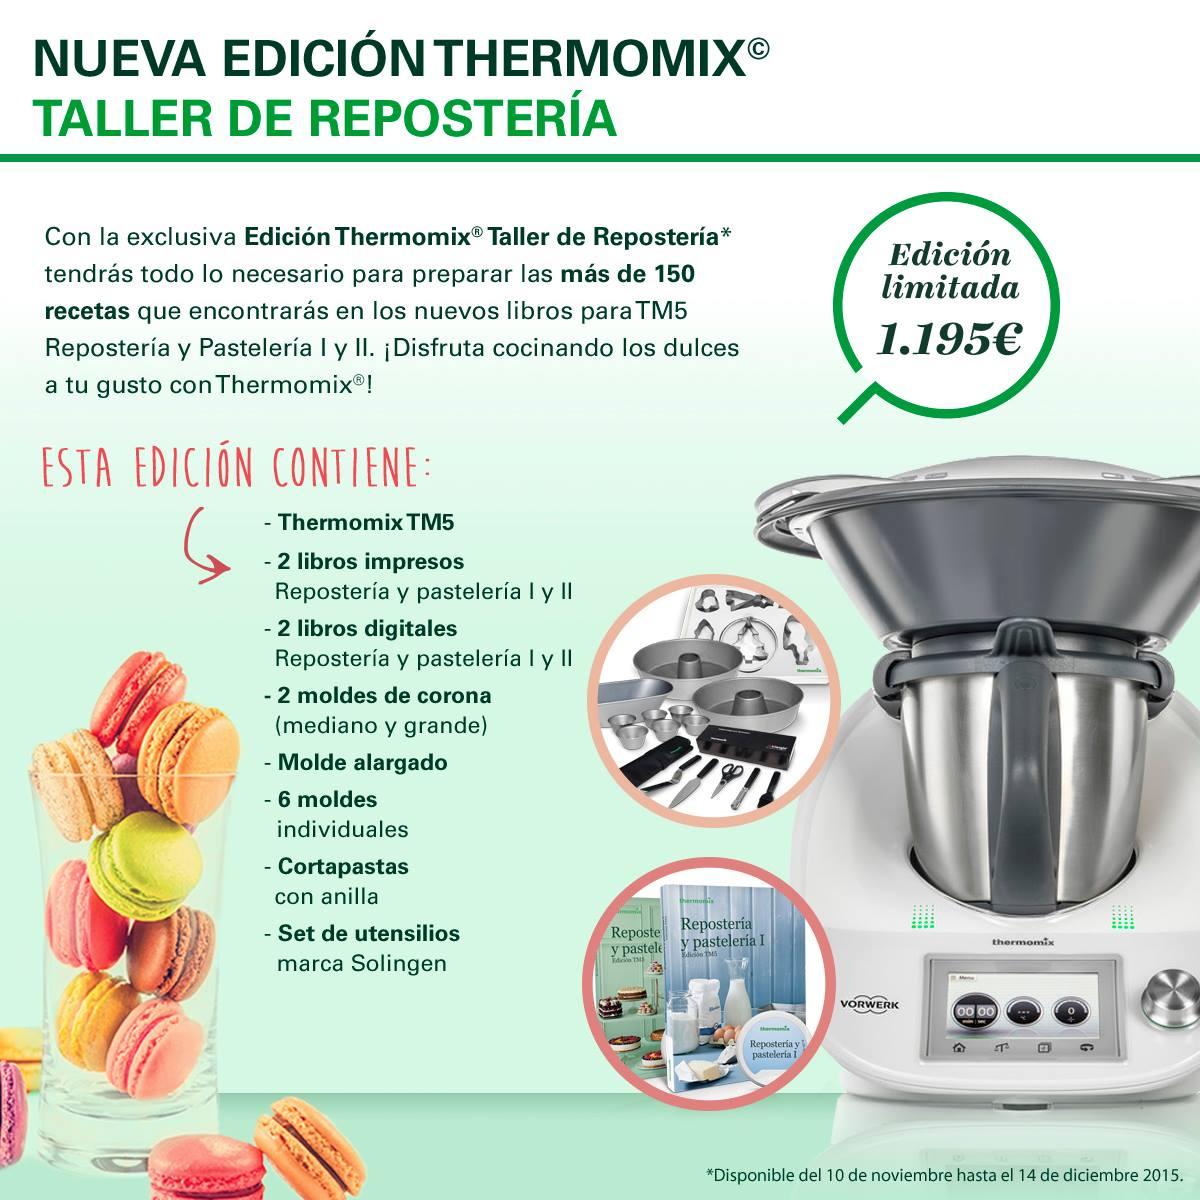 NUEVA EDICION Thermomix® TALLER DE REPOSTERIA